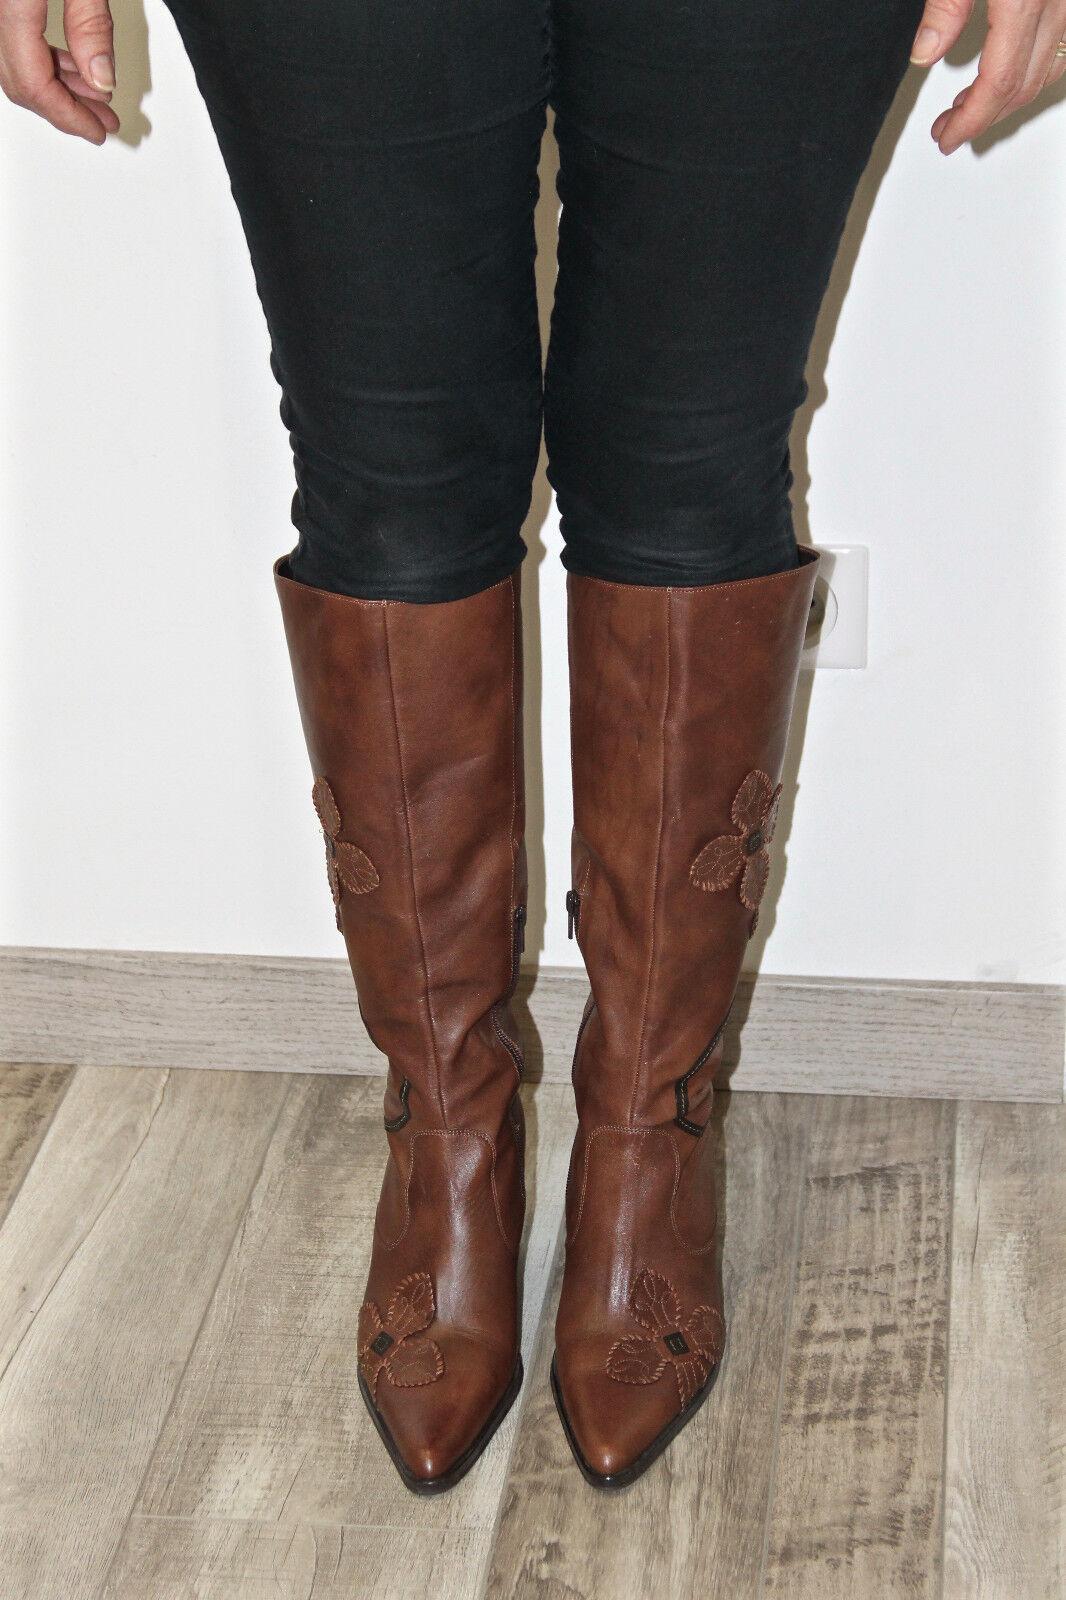 Pretty Stiefel heels 40 Braun Leder zipped BOCAGE Größe 40 heels NEW BOXED 541692